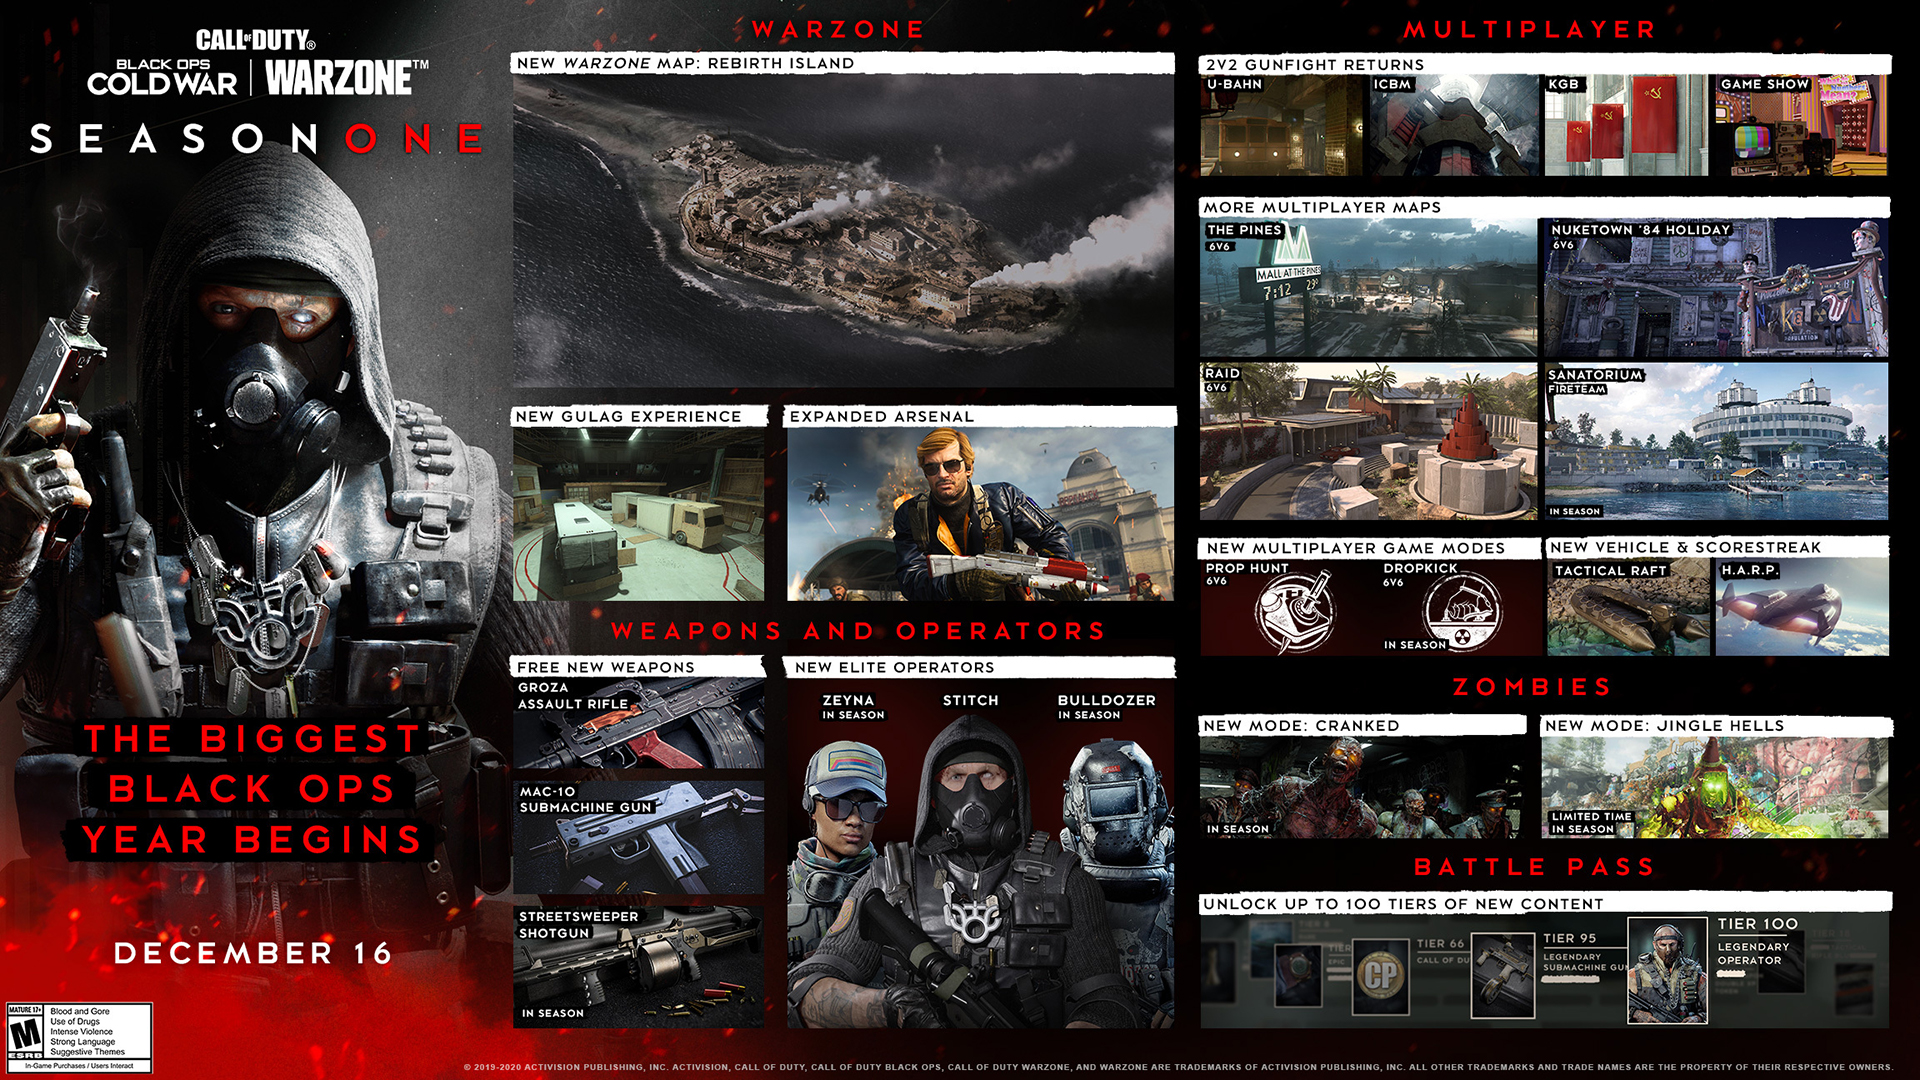 black ops cold war update 1.09